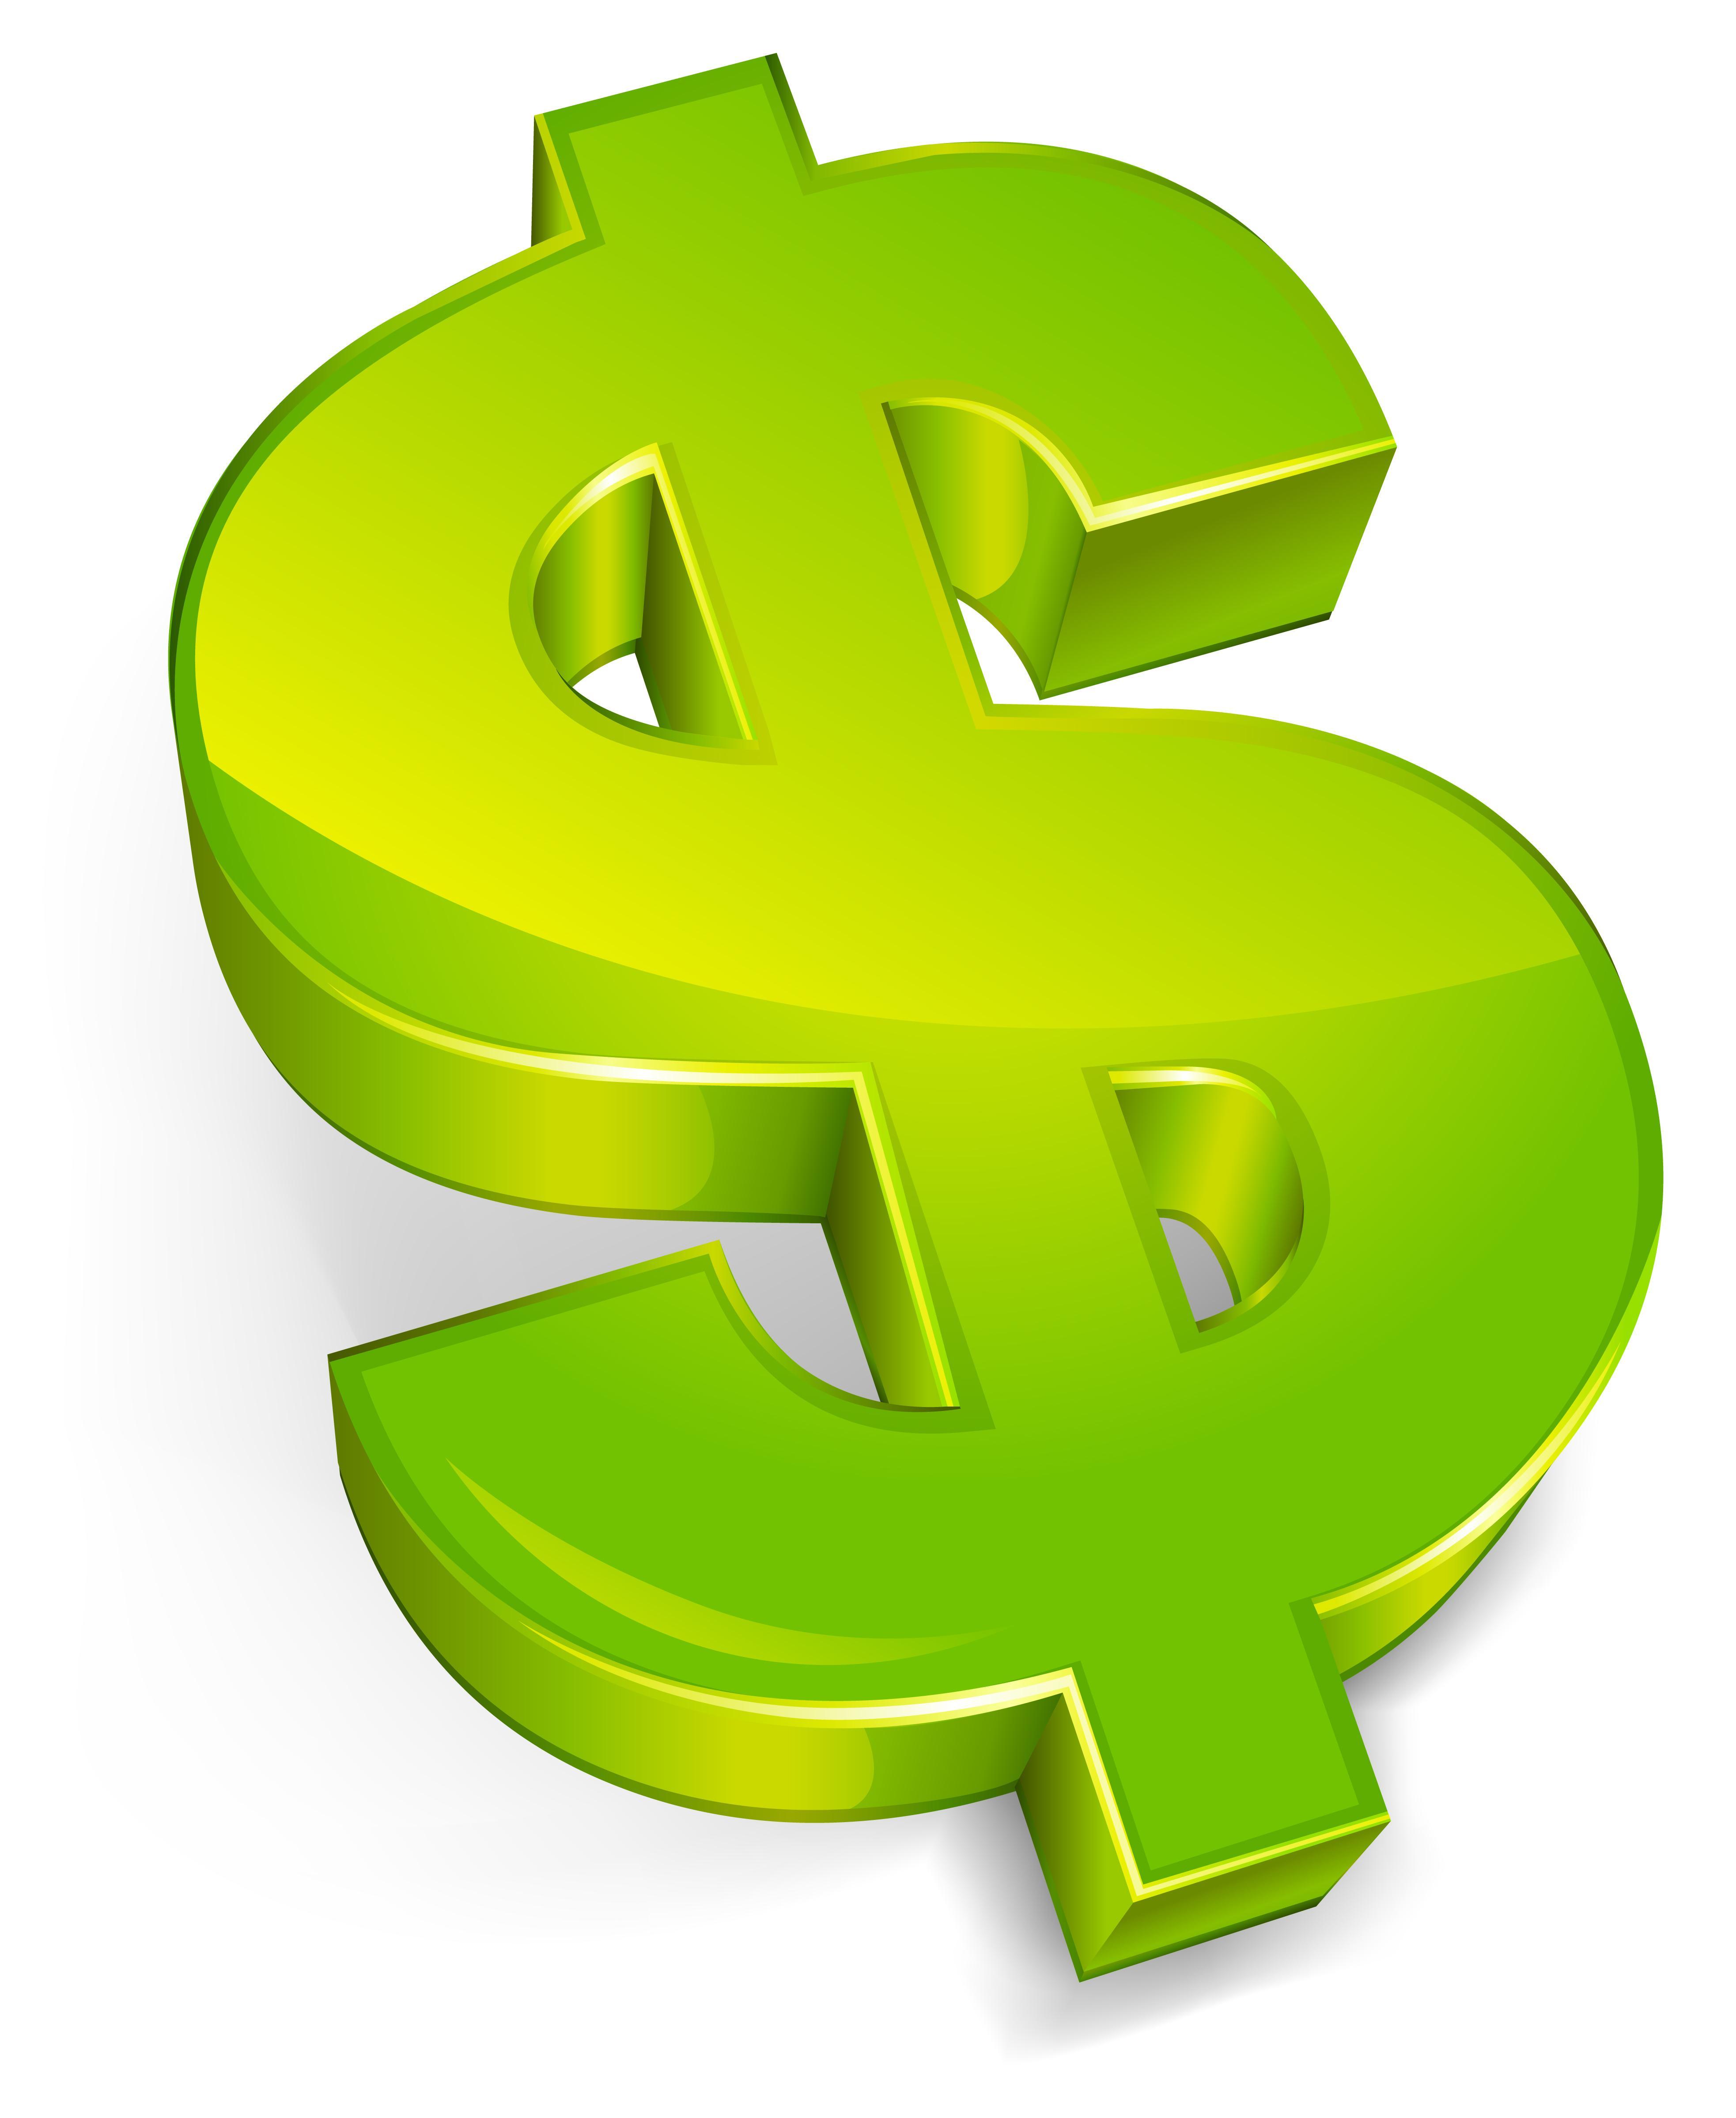 Free money symbol clipart jpg library stock Best Money Symbol Clipart #95 - Clipartion.com jpg library stock